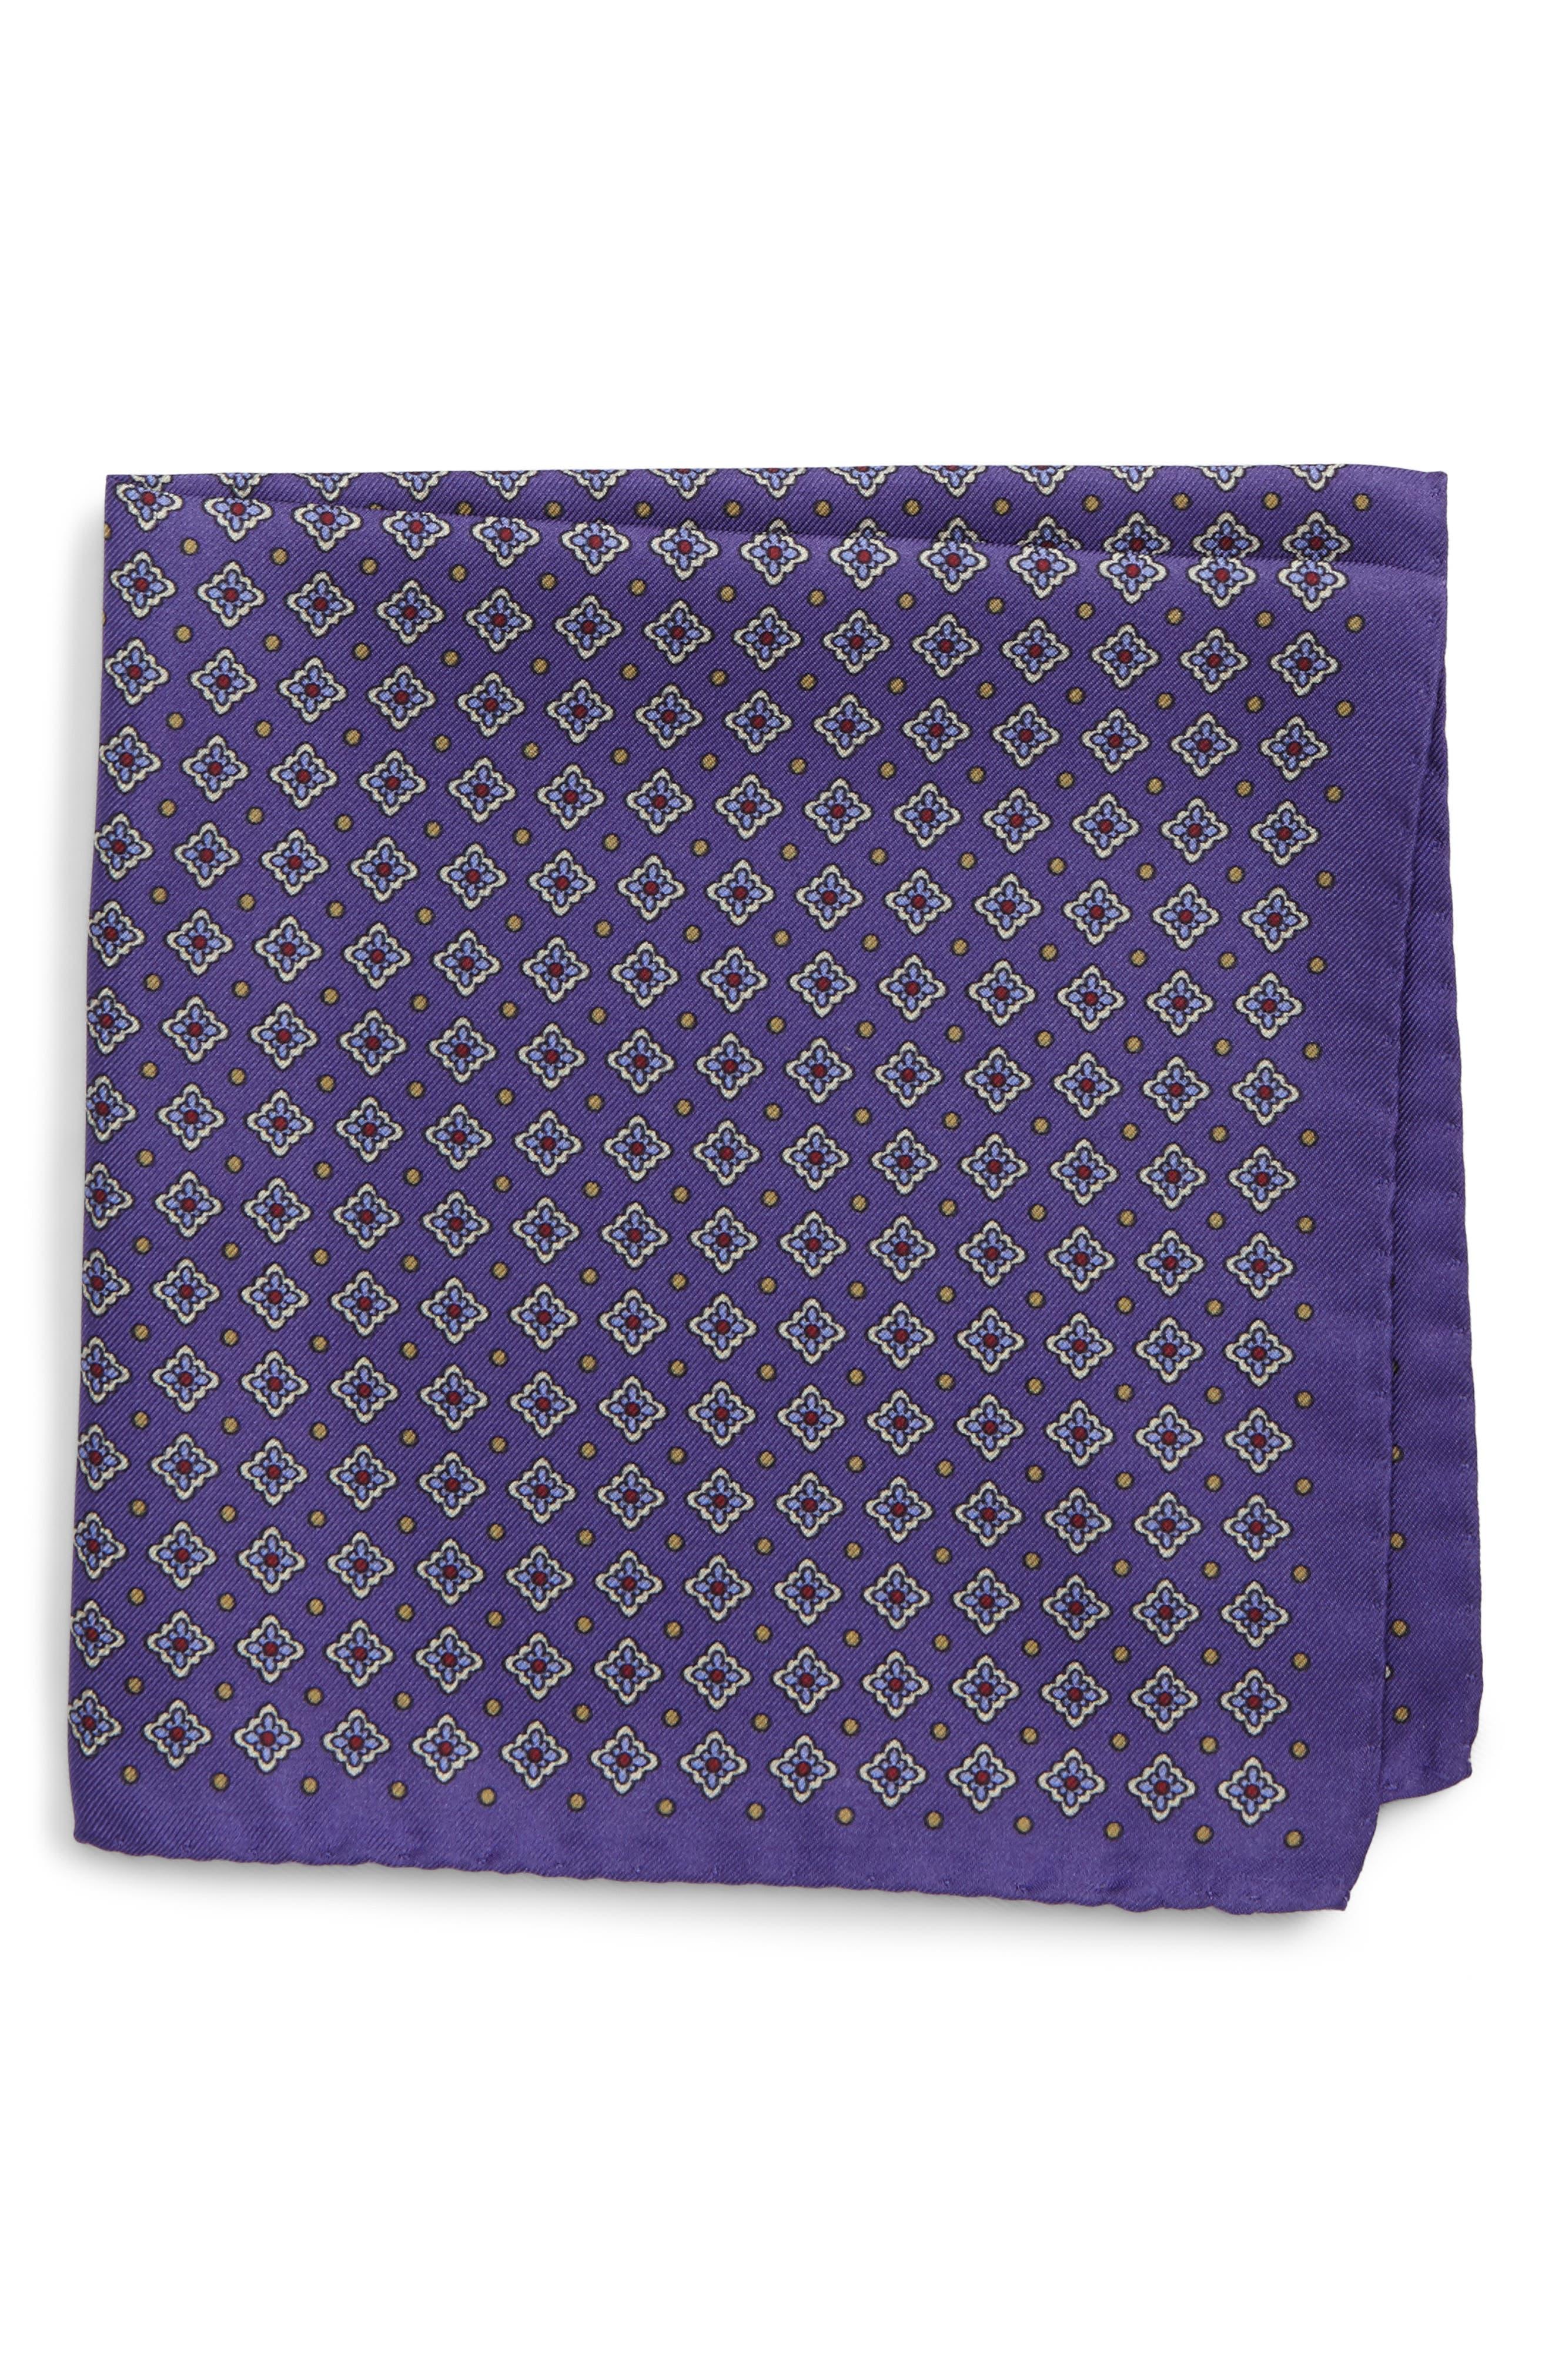 Alternate Image 1 Selected - Eton Medallion Silk Pocket Square